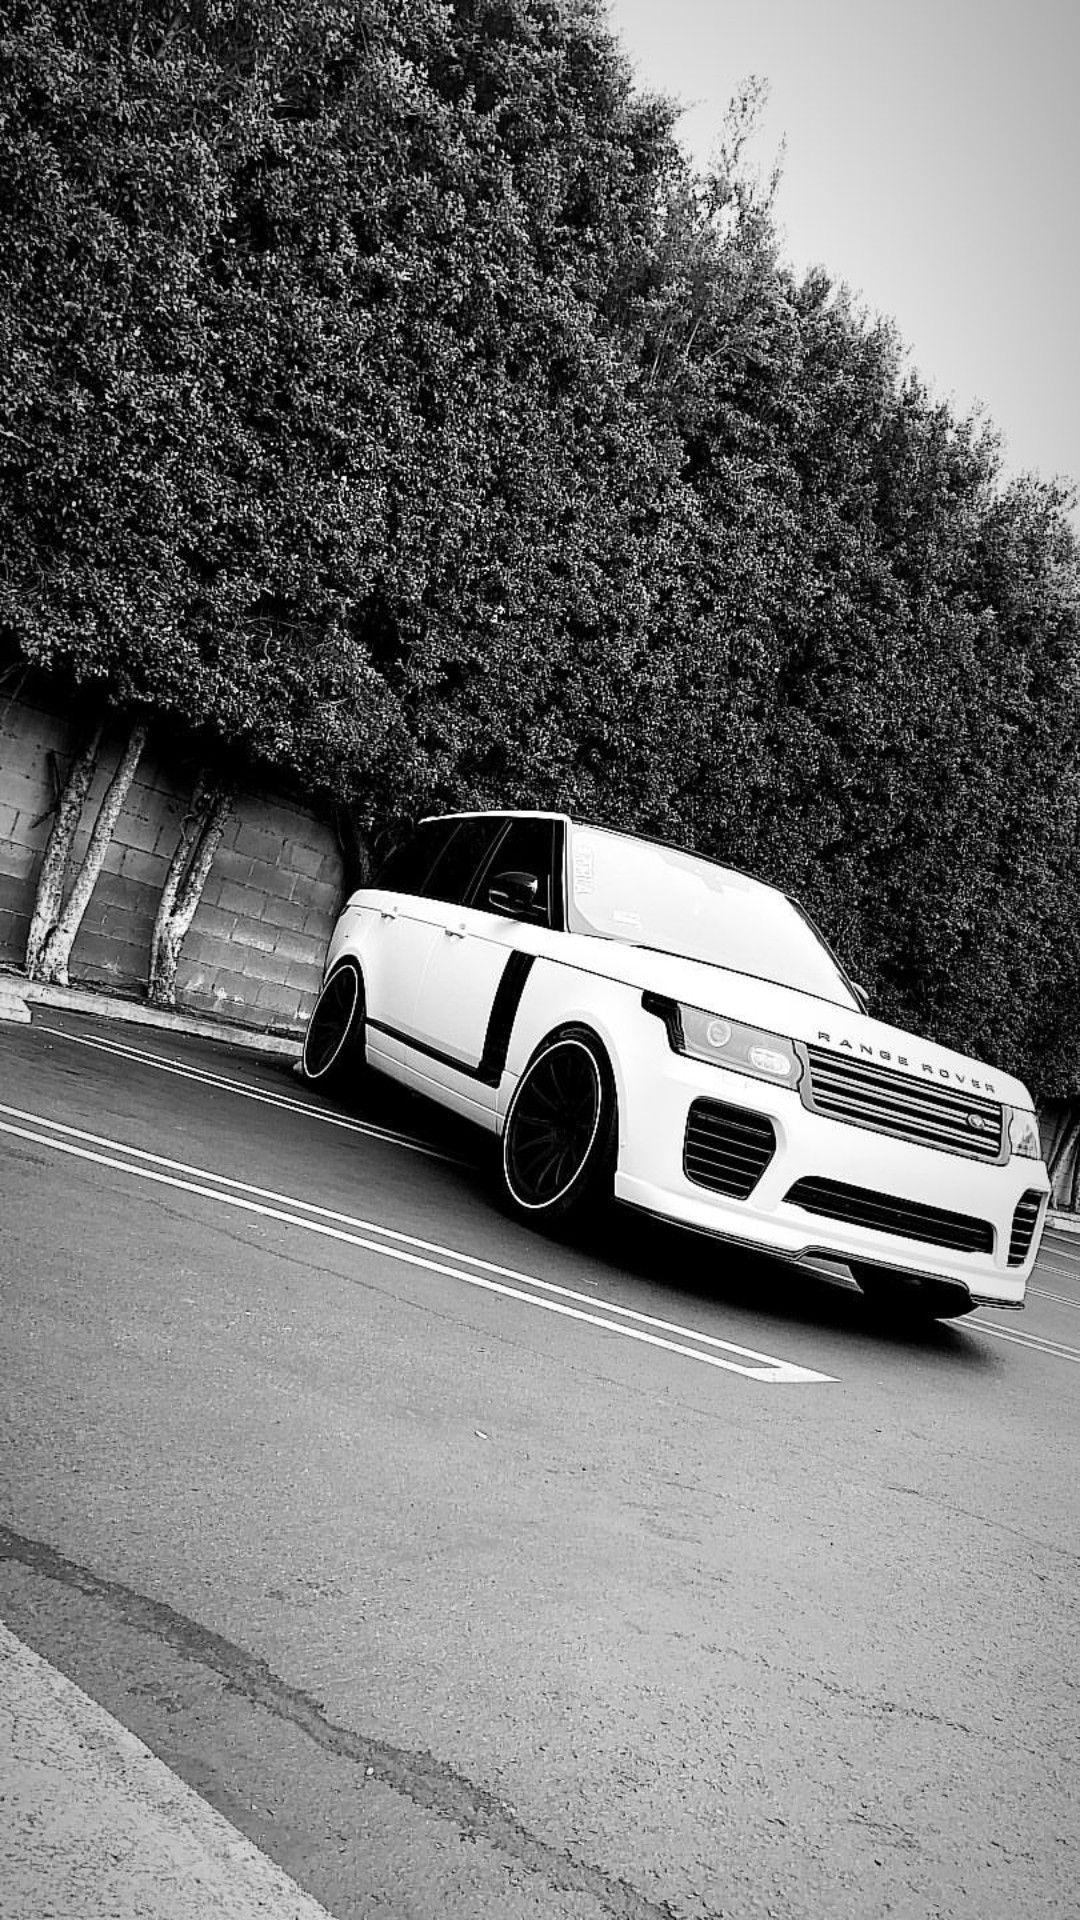 Pin By Wala Diri On Rᴀɴɢᴇ Rᴏᴠᴇʀ Fantasy Cars Dream Cars Jeep Suv